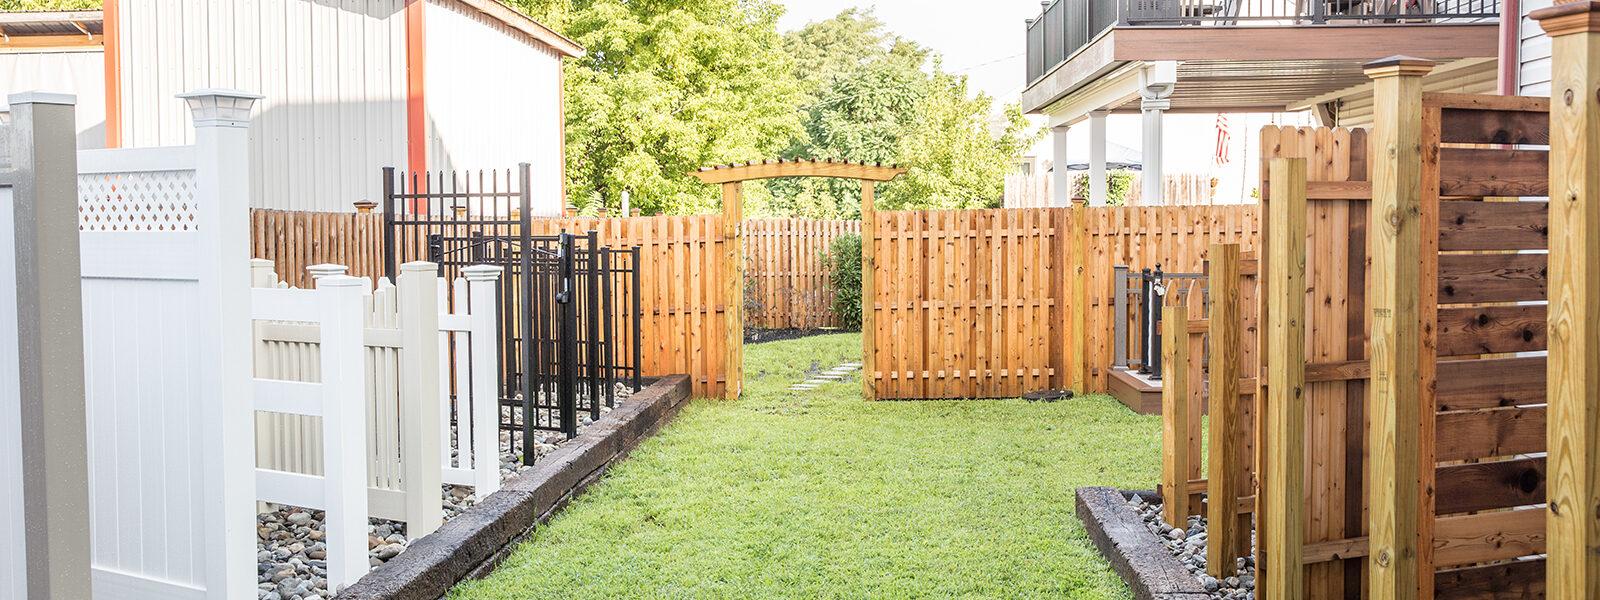 integrous showroom fences